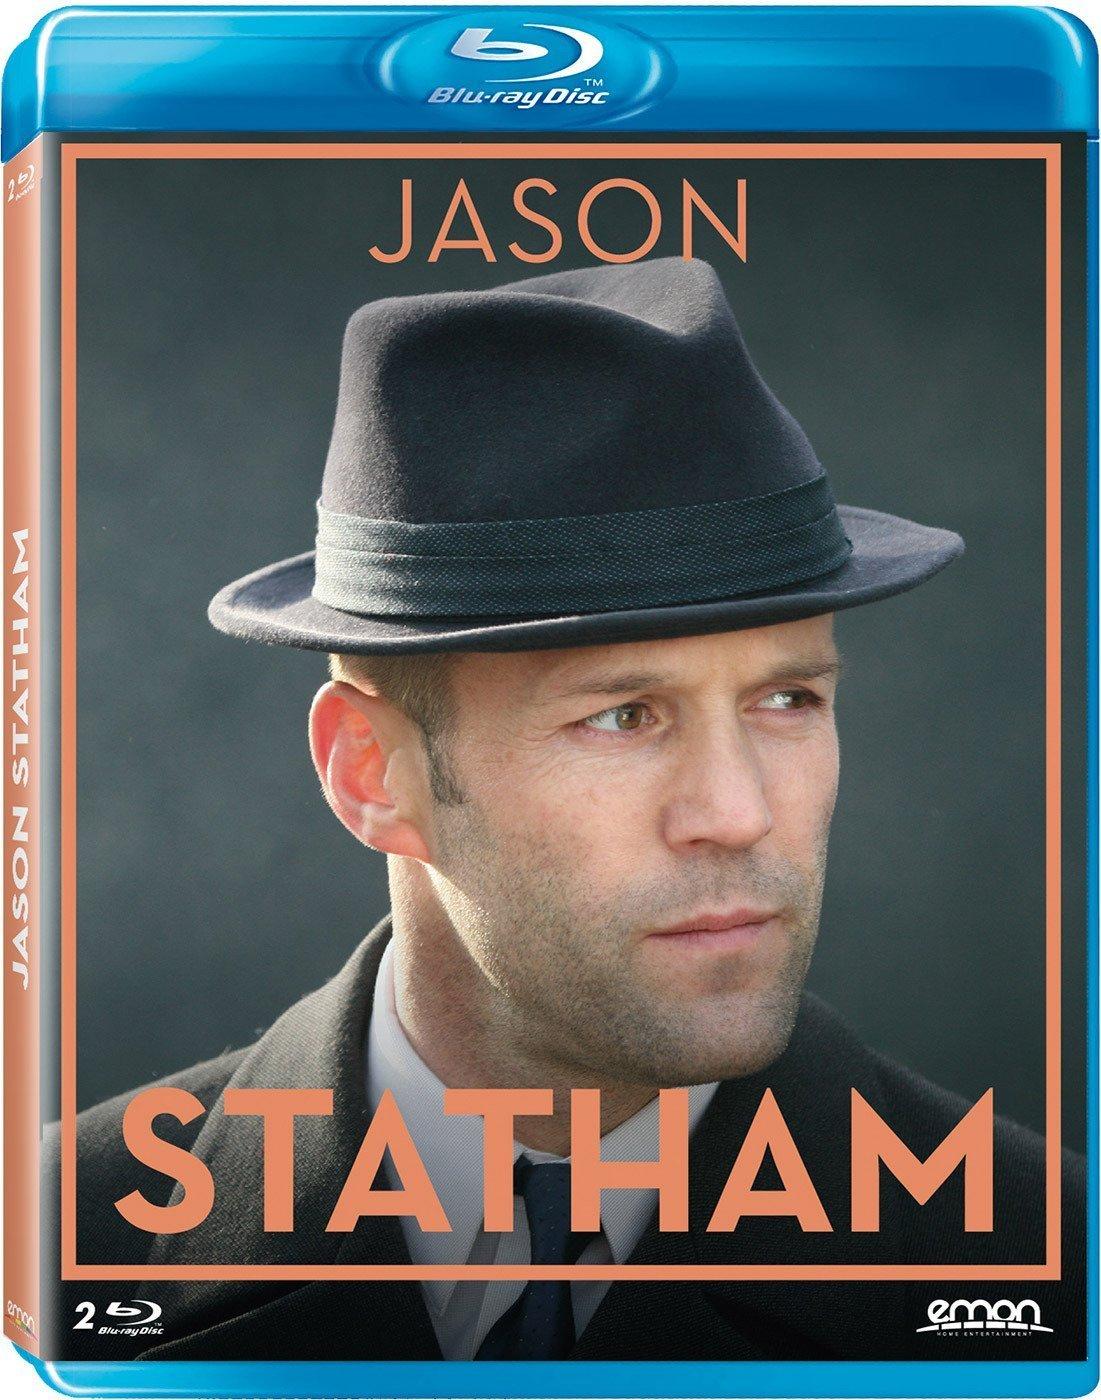 Pack Jason Statham: Asesinos De Élite + Los Mercenarios Blu-ray: Amazon.es: Jason Statham, Clive Owen, Robert De Niro, Sylvester Stallone, Jet Li, Gary McKendry, Sylvester Stallone, Jason Statham, Clive Owen: Cine y